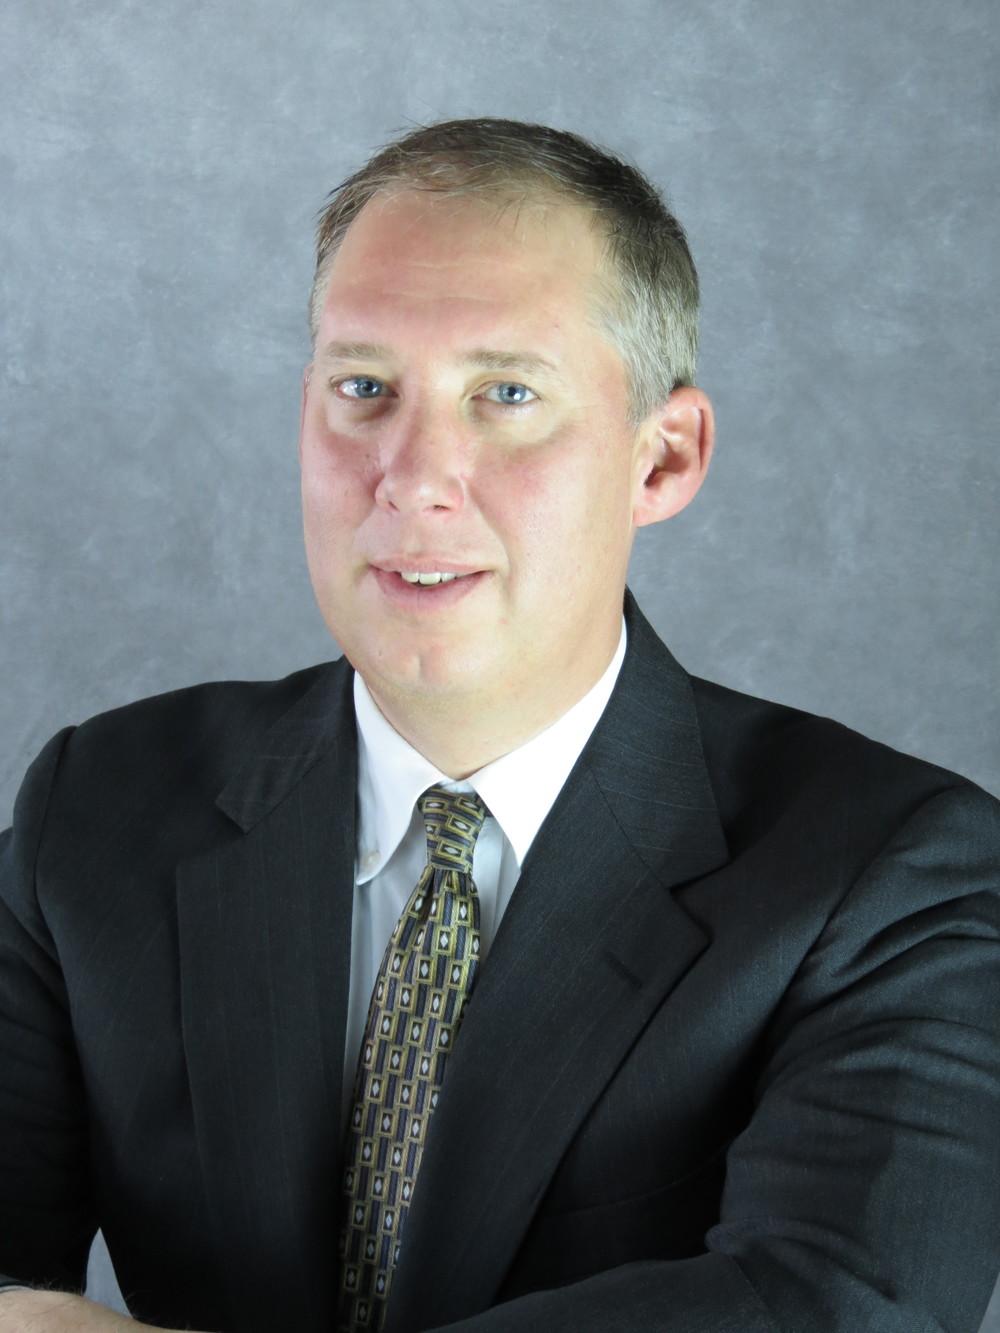 Dean Haen, Director